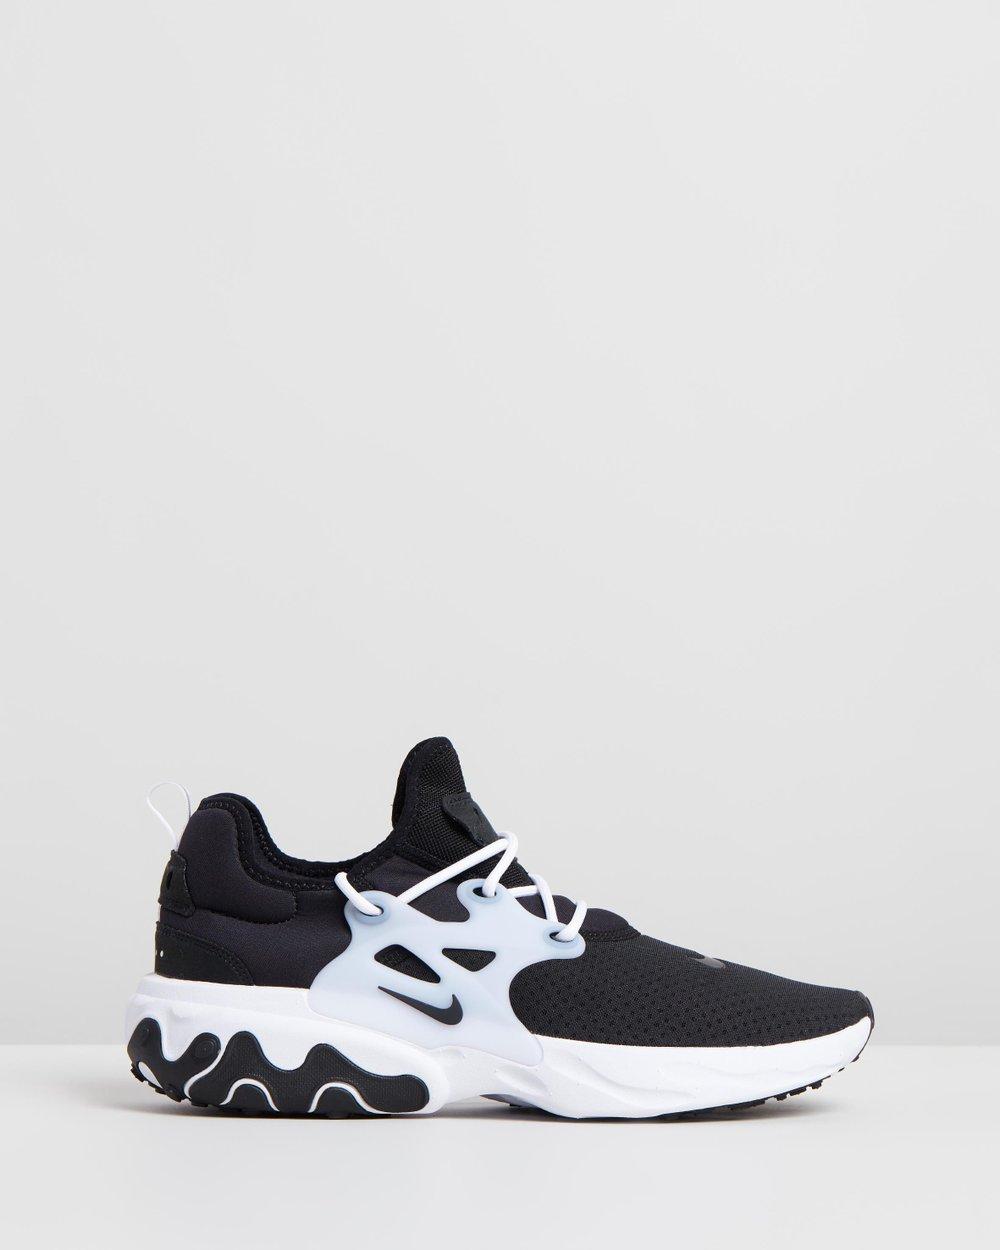 super specials check out fresh styles Nike React Presto - Men's